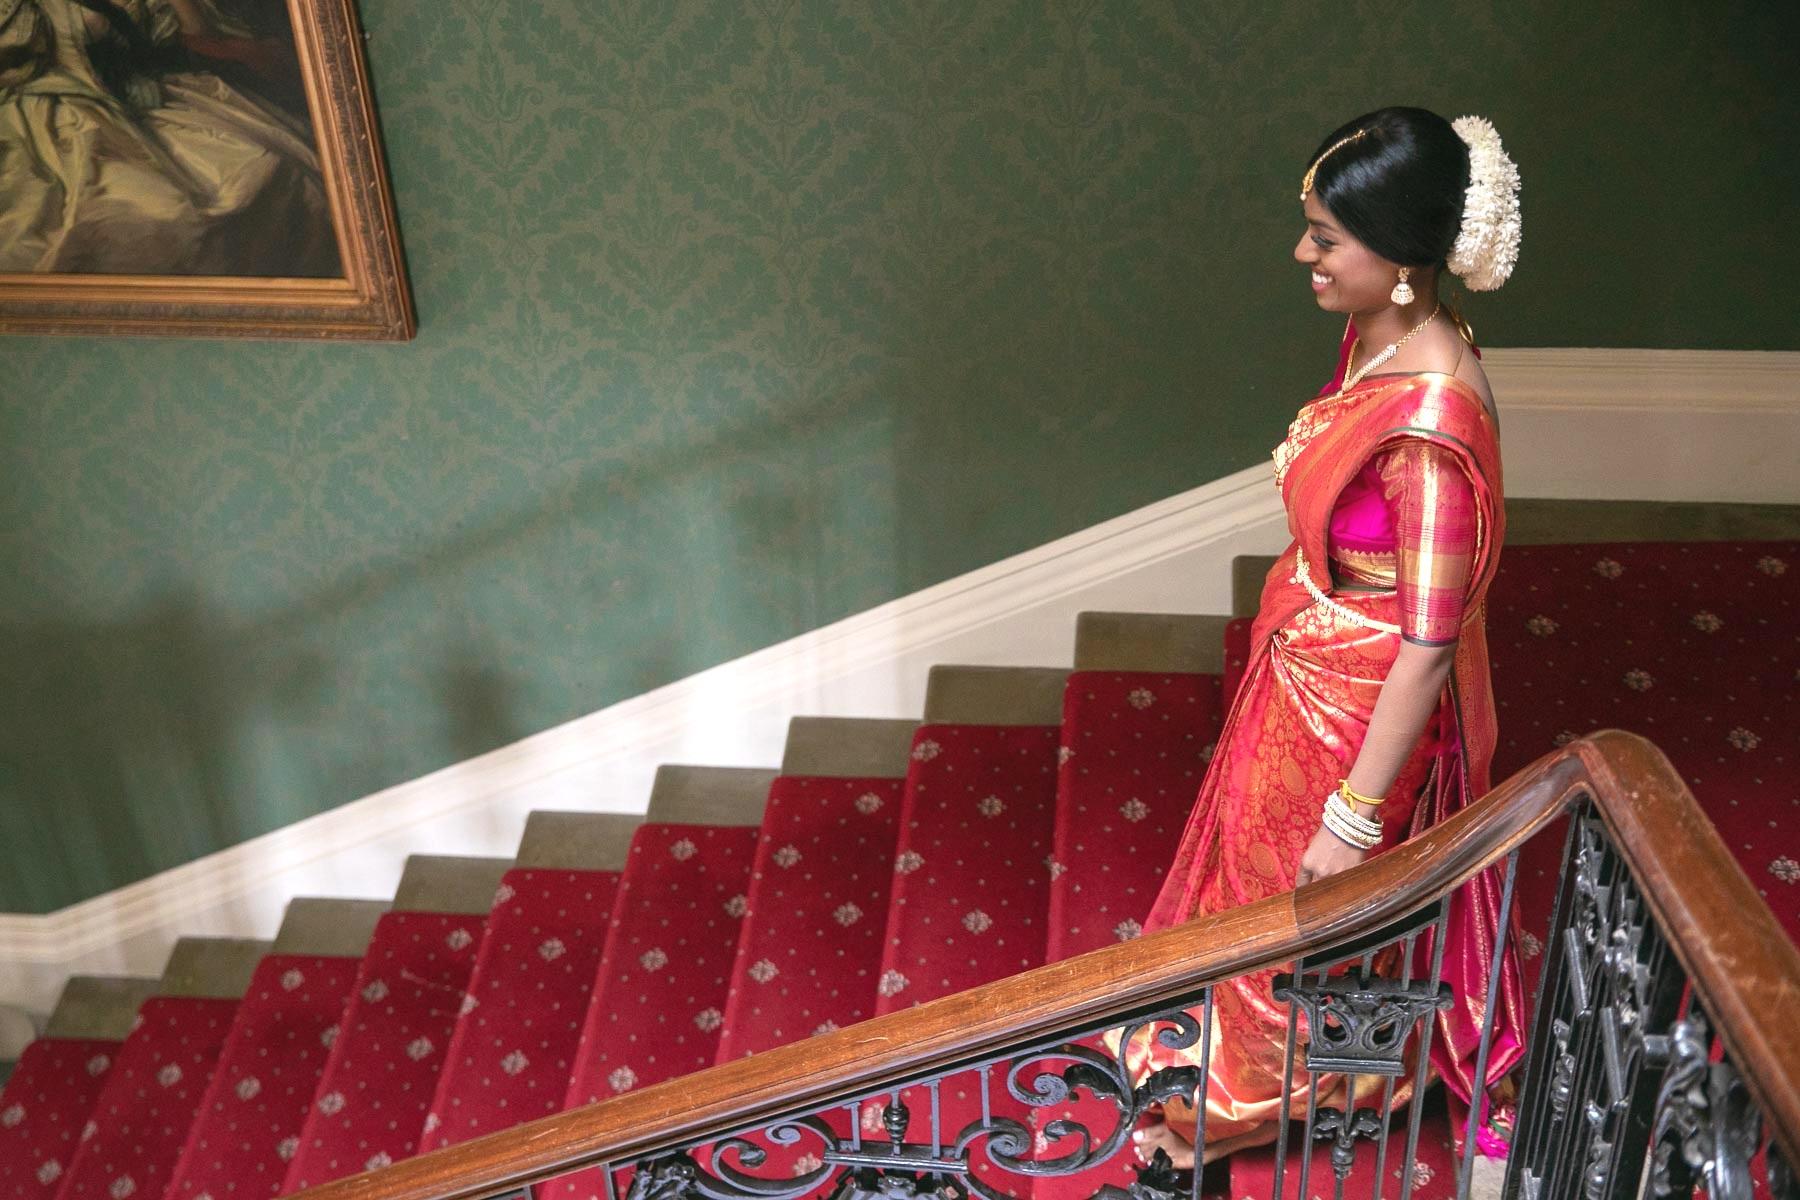 Addington-Palace-Tamil-wedding-photographer-surrey-london-natalia-smith-photography-0019.jpg